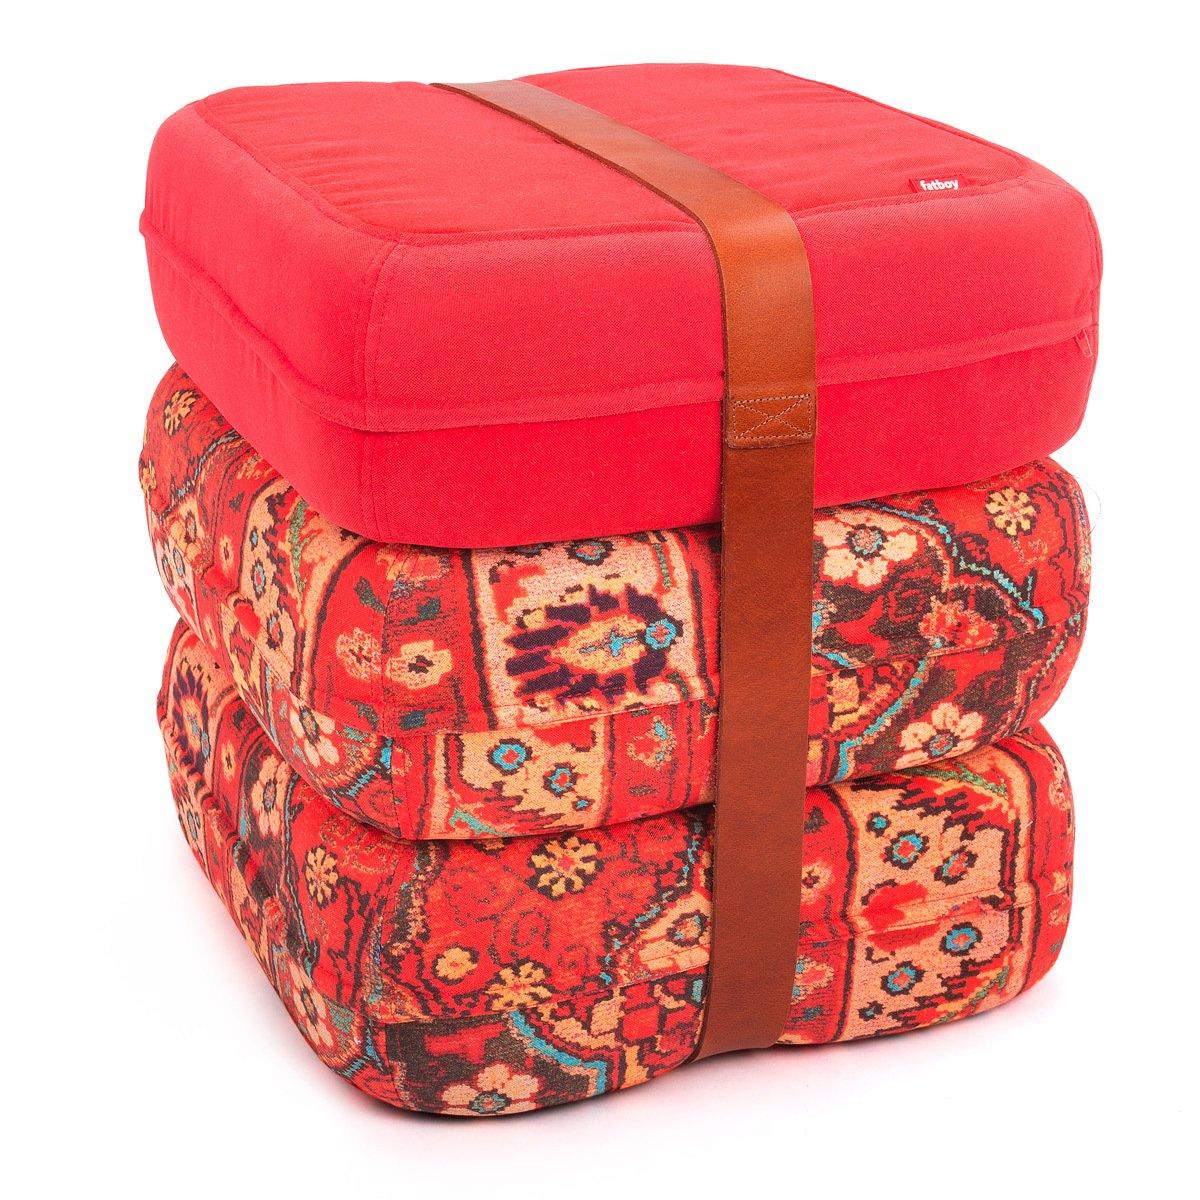 Fatboy 900.6325 Baboesjka Ali Baba ROT - 3er Set Sitzkissen mit Ledergurt in rot